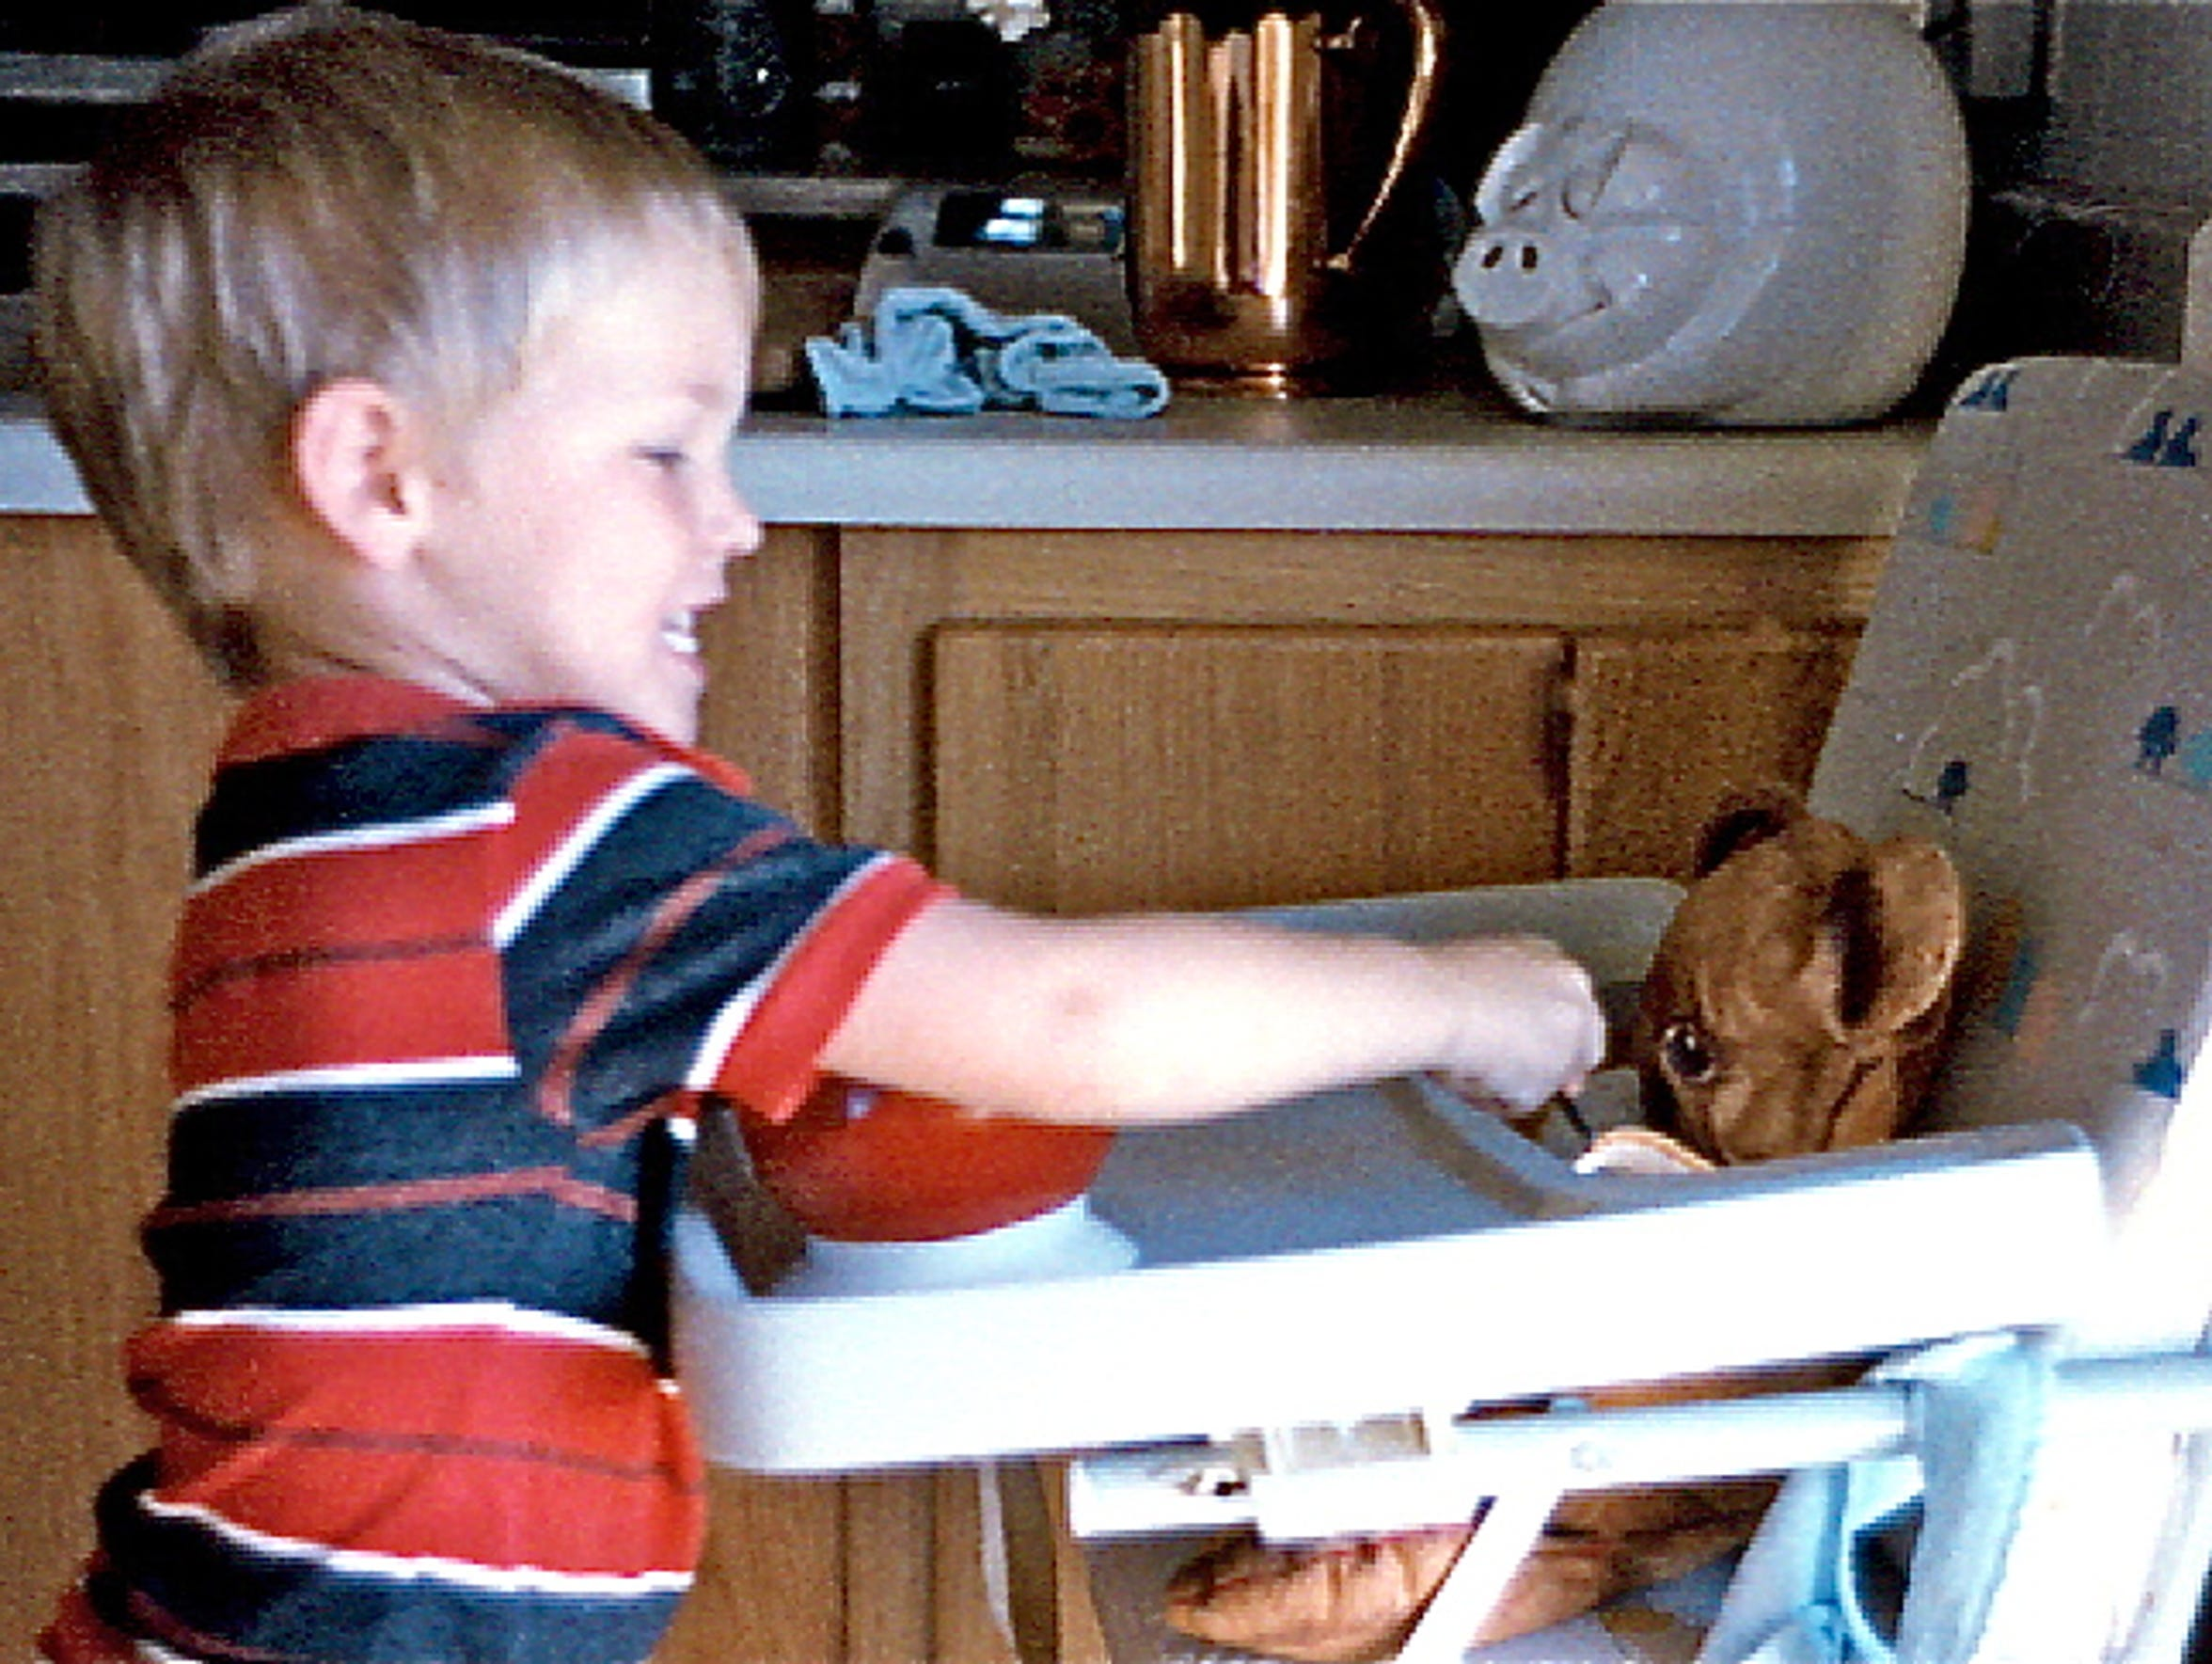 Sandy Swenson's son, Joey, feeds a stuffed bear as